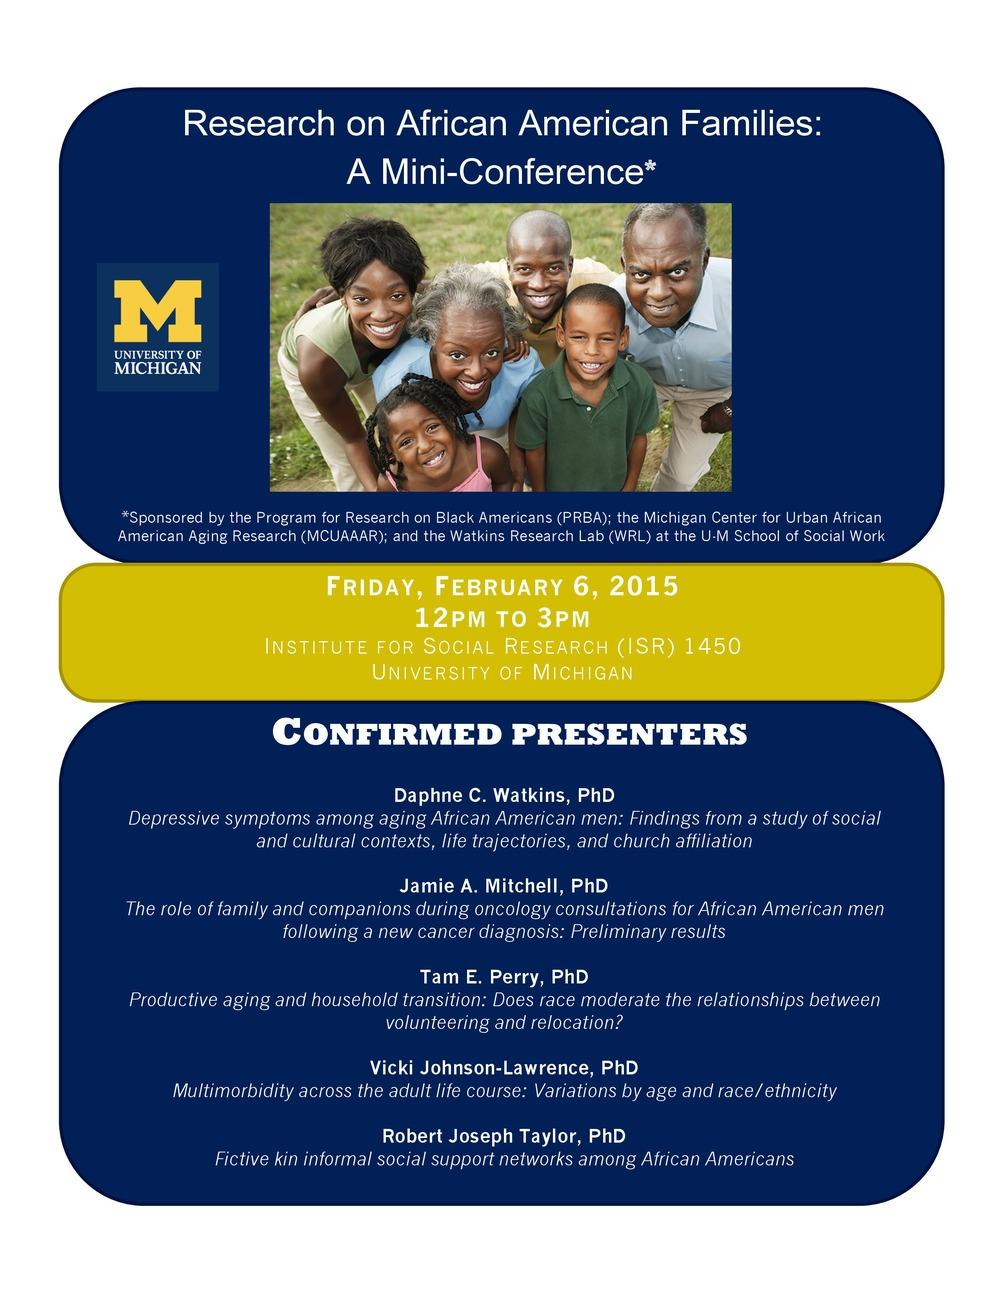 Final--Mini-conference_Feb6_2015.jpg